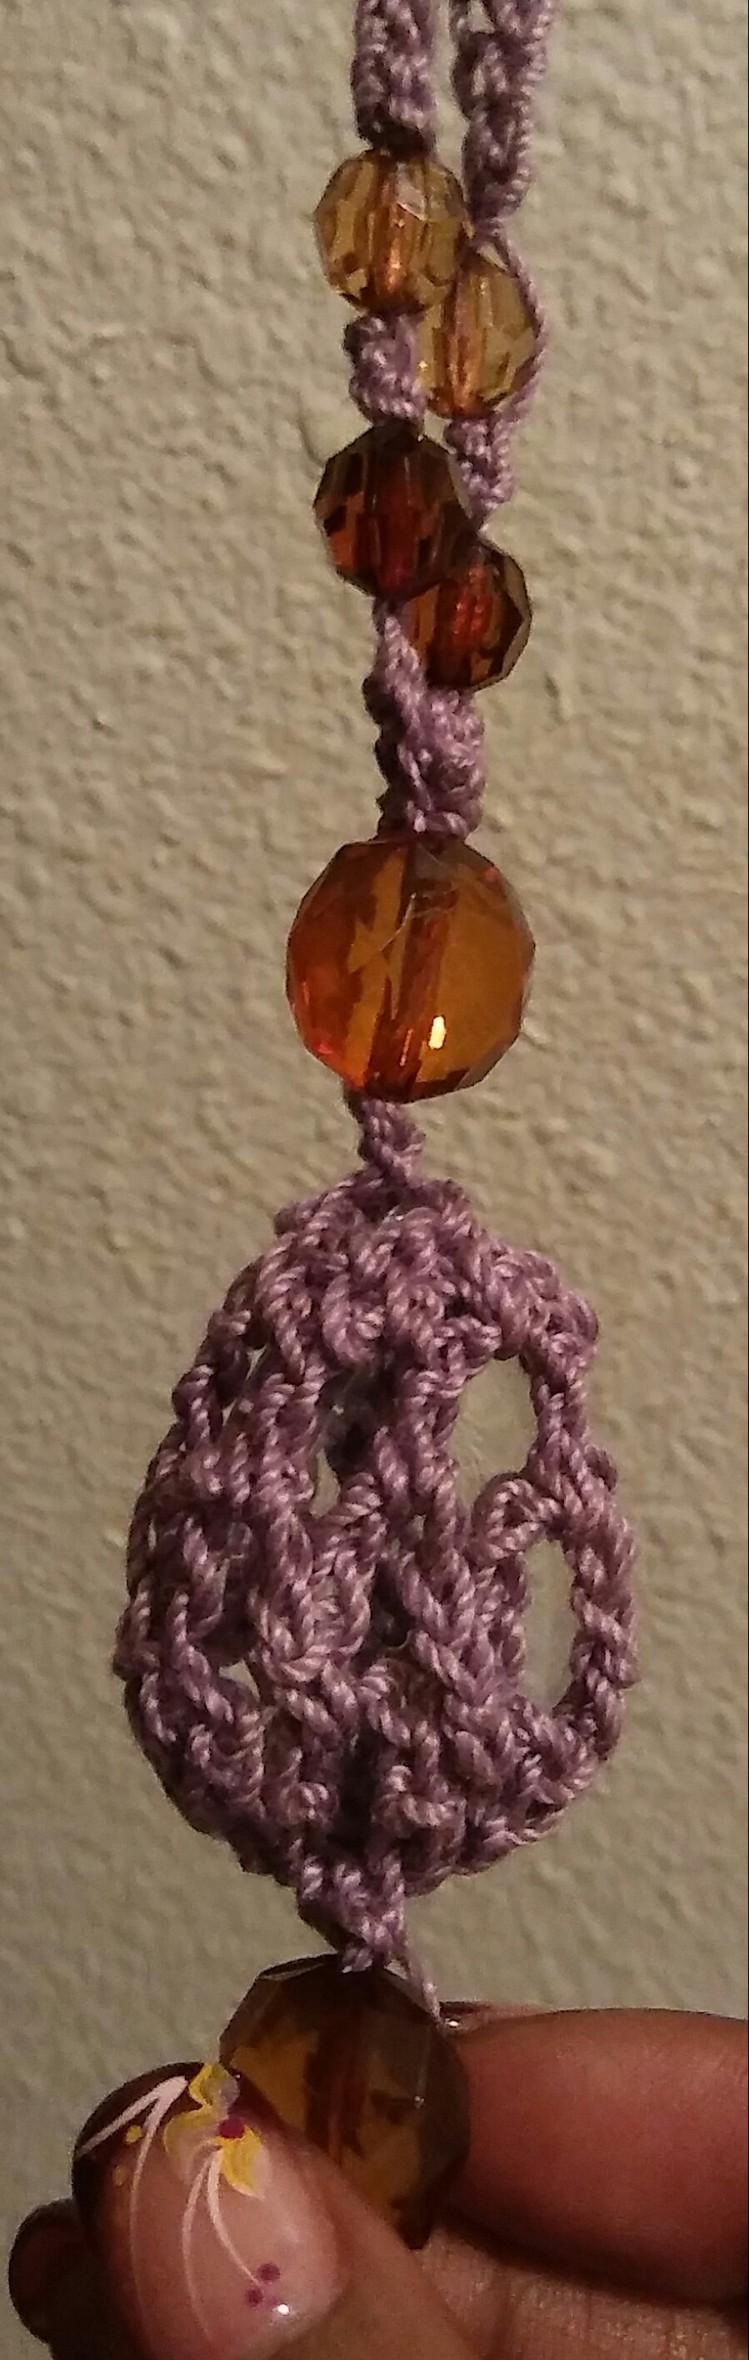 Crocheted Gem-Facet Beaded Necklace